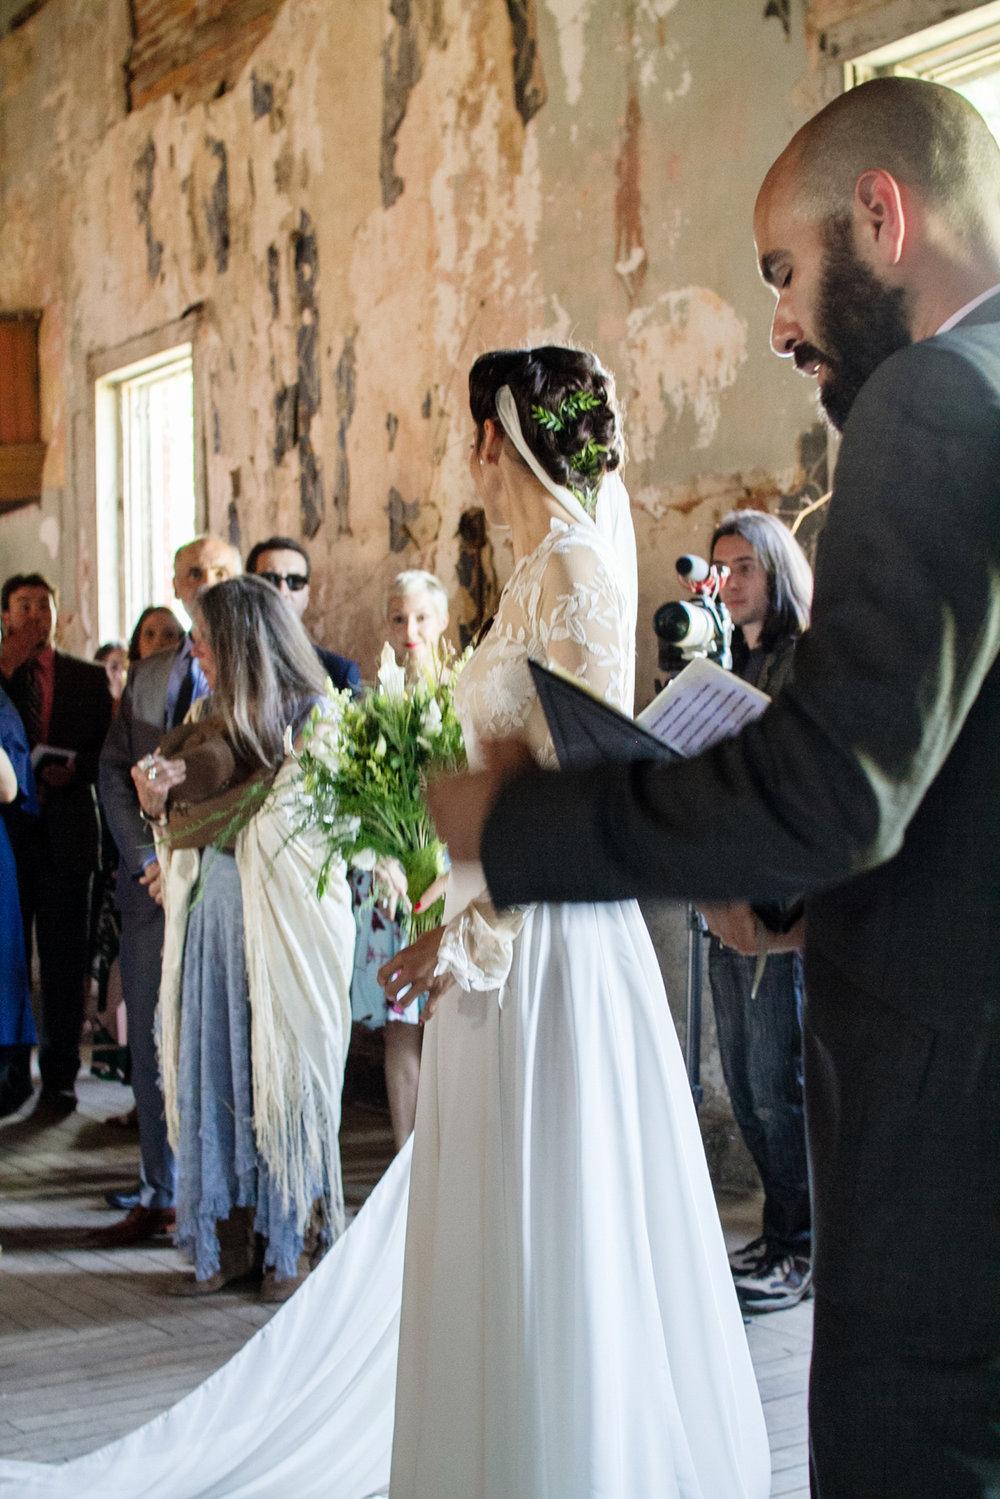 Kimberly-Coccagnia-Wedding-Photographer-69.JPG